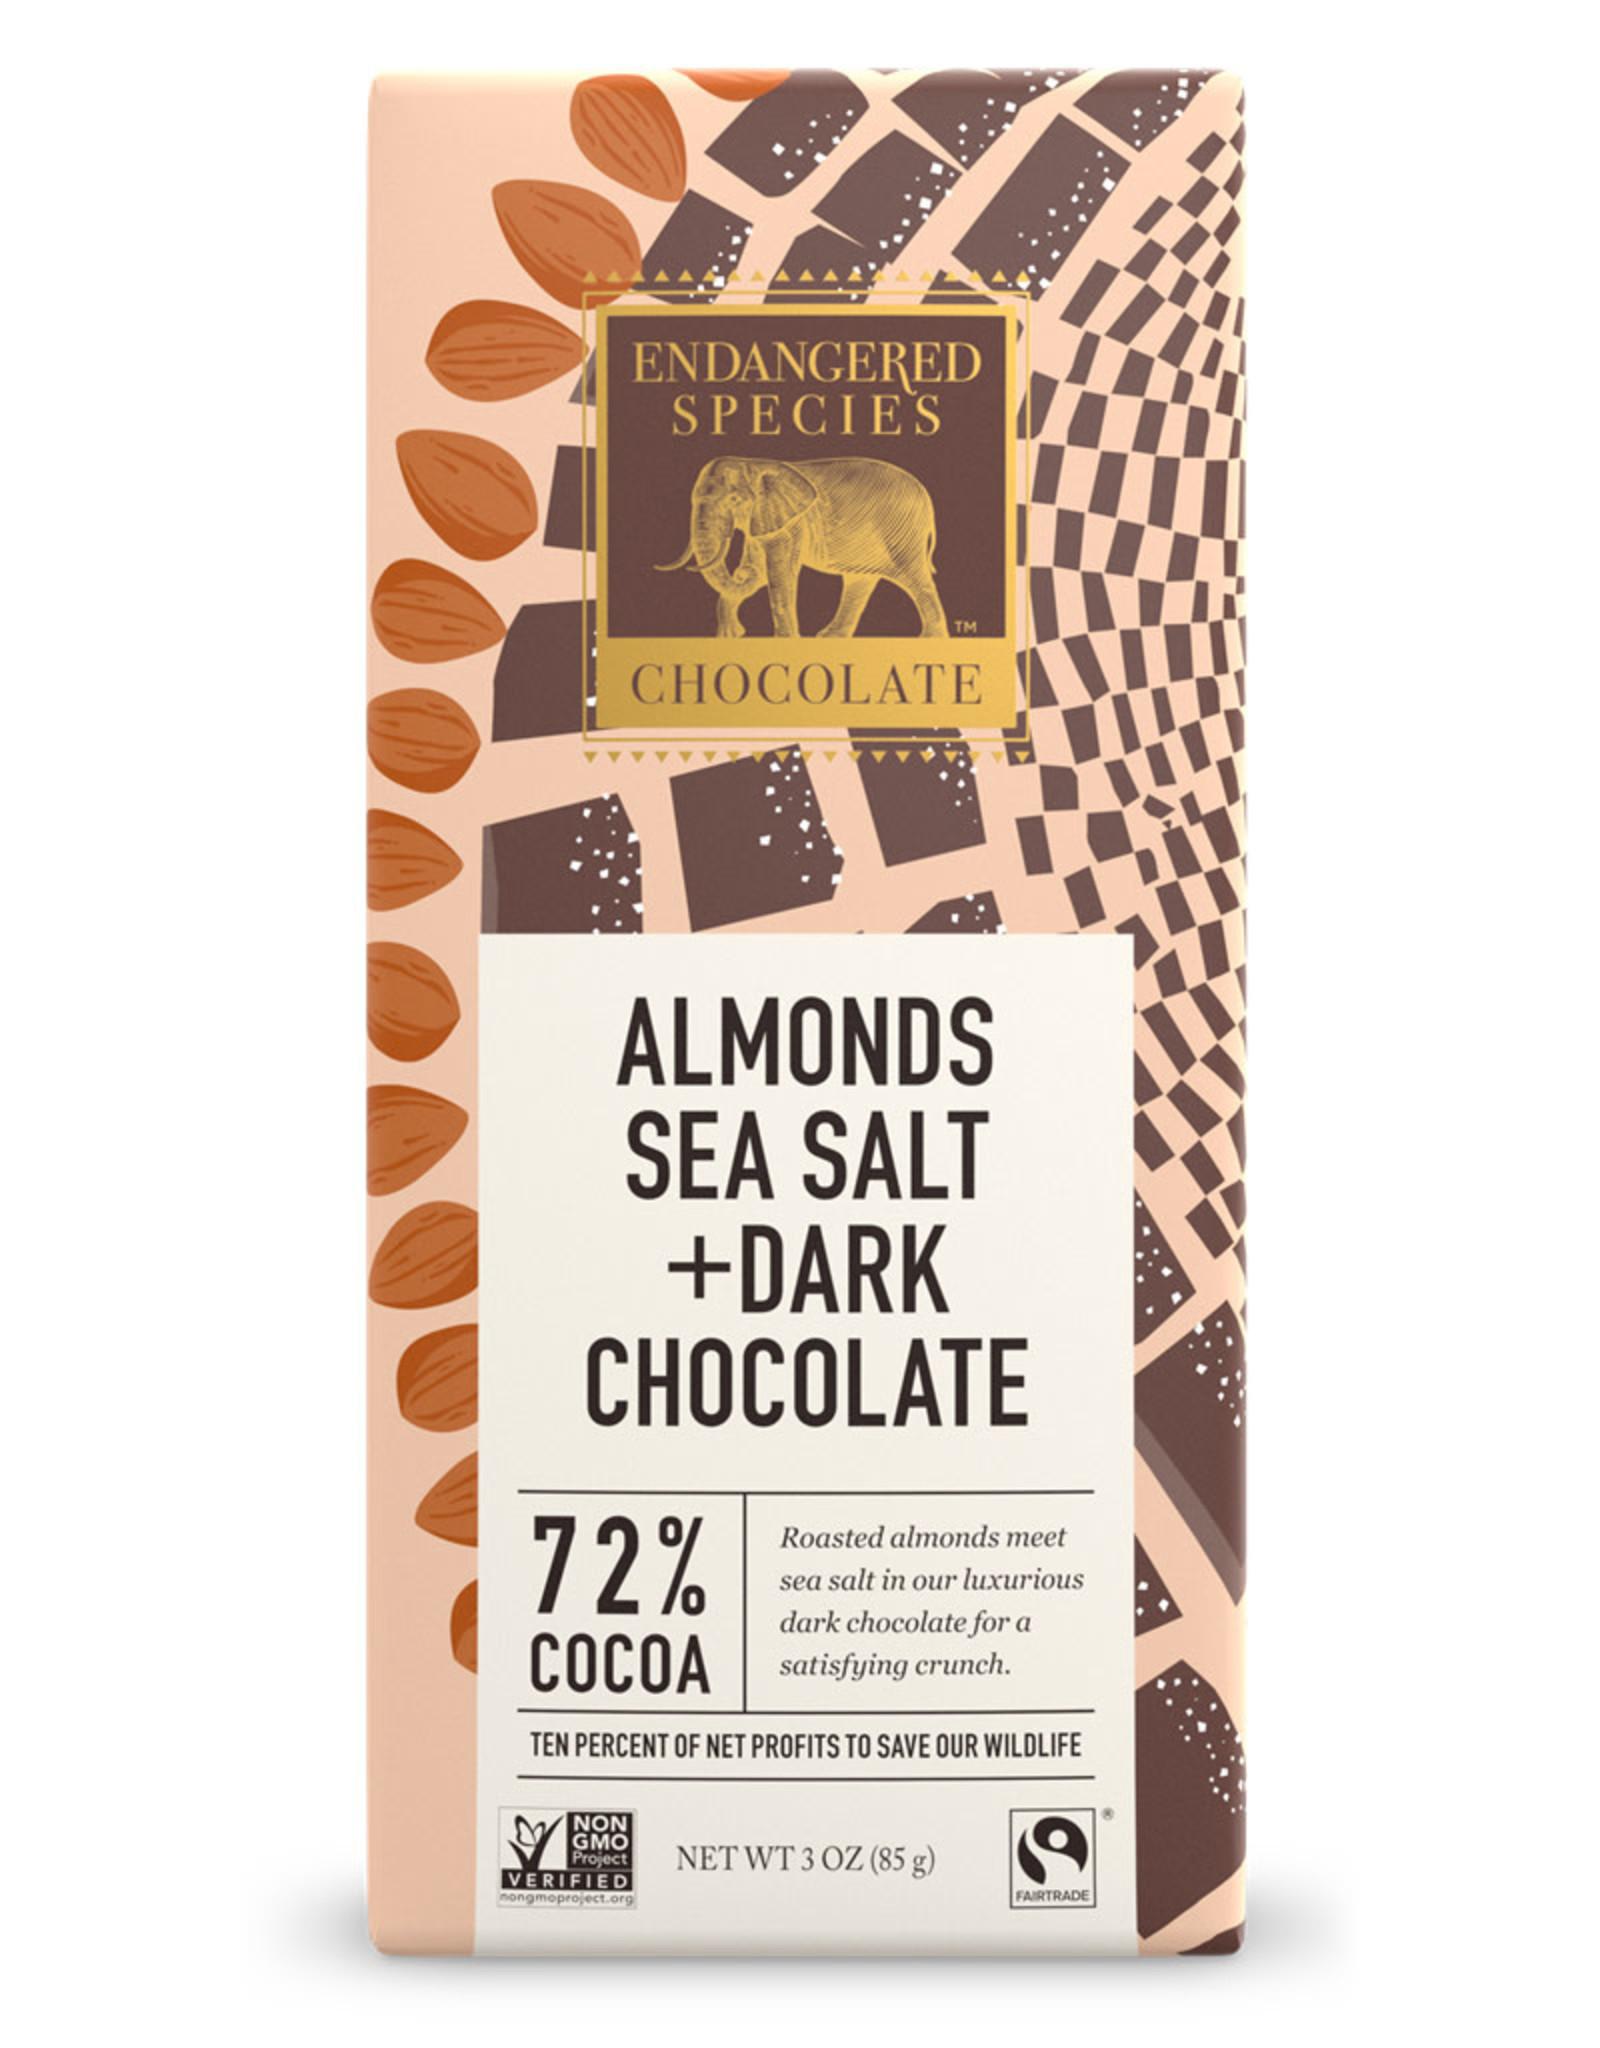 Endangered Species Endangered Species - Dark Chocolate Bar, Sea Salt & Almonds